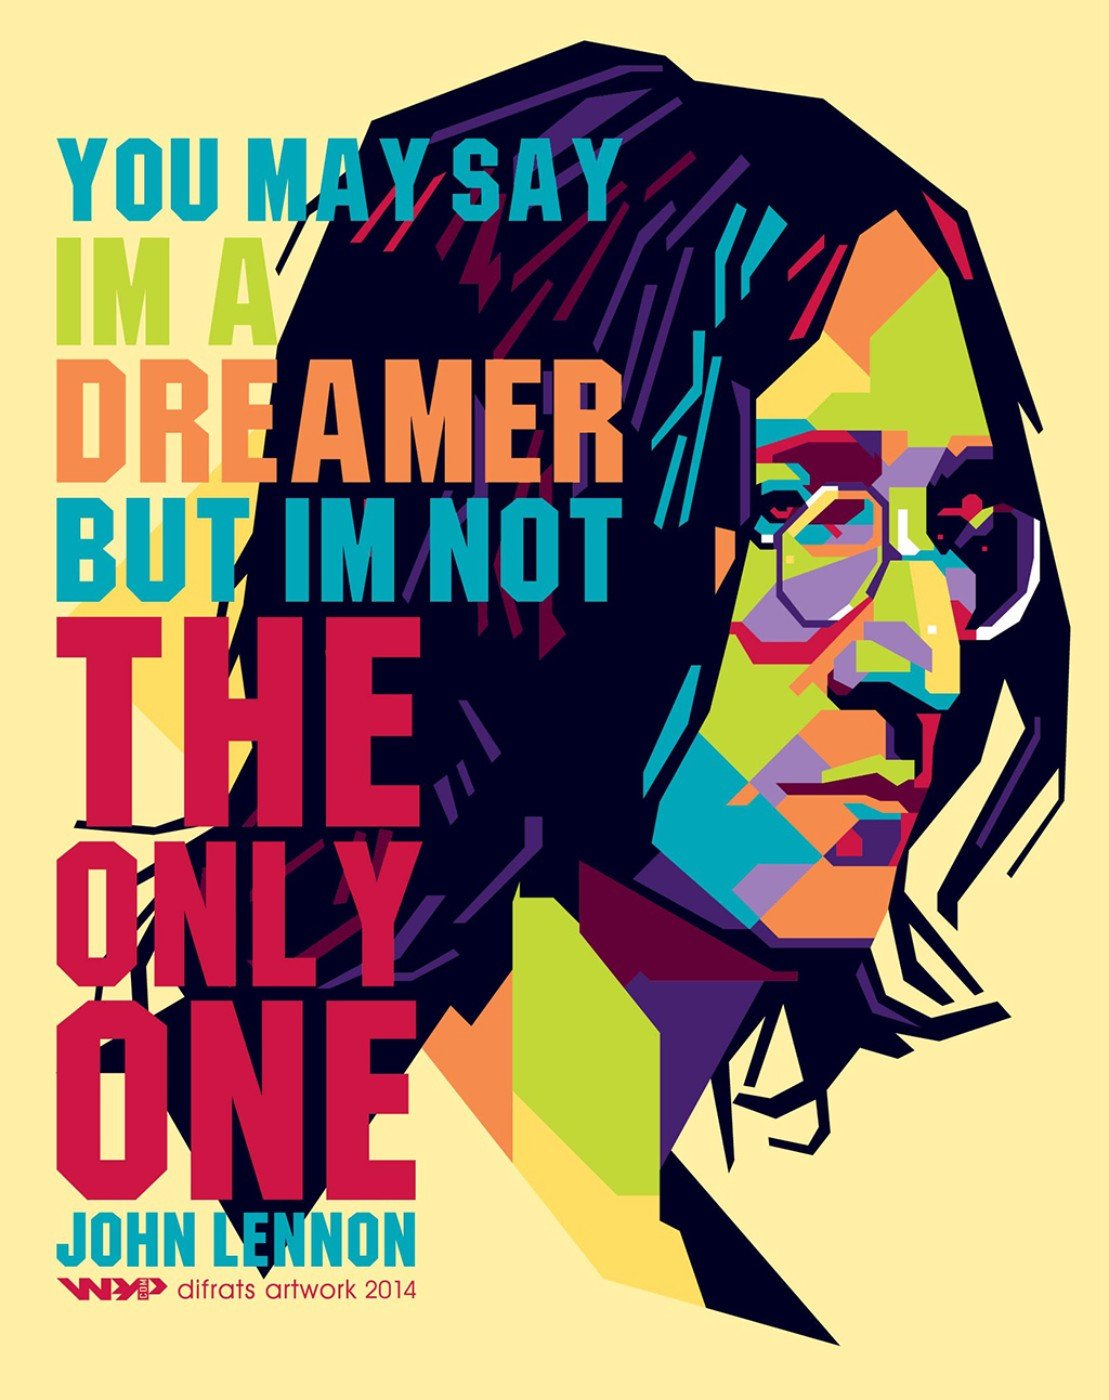 Bedah Lagu Imagine John Lennon Distorsi Kasar